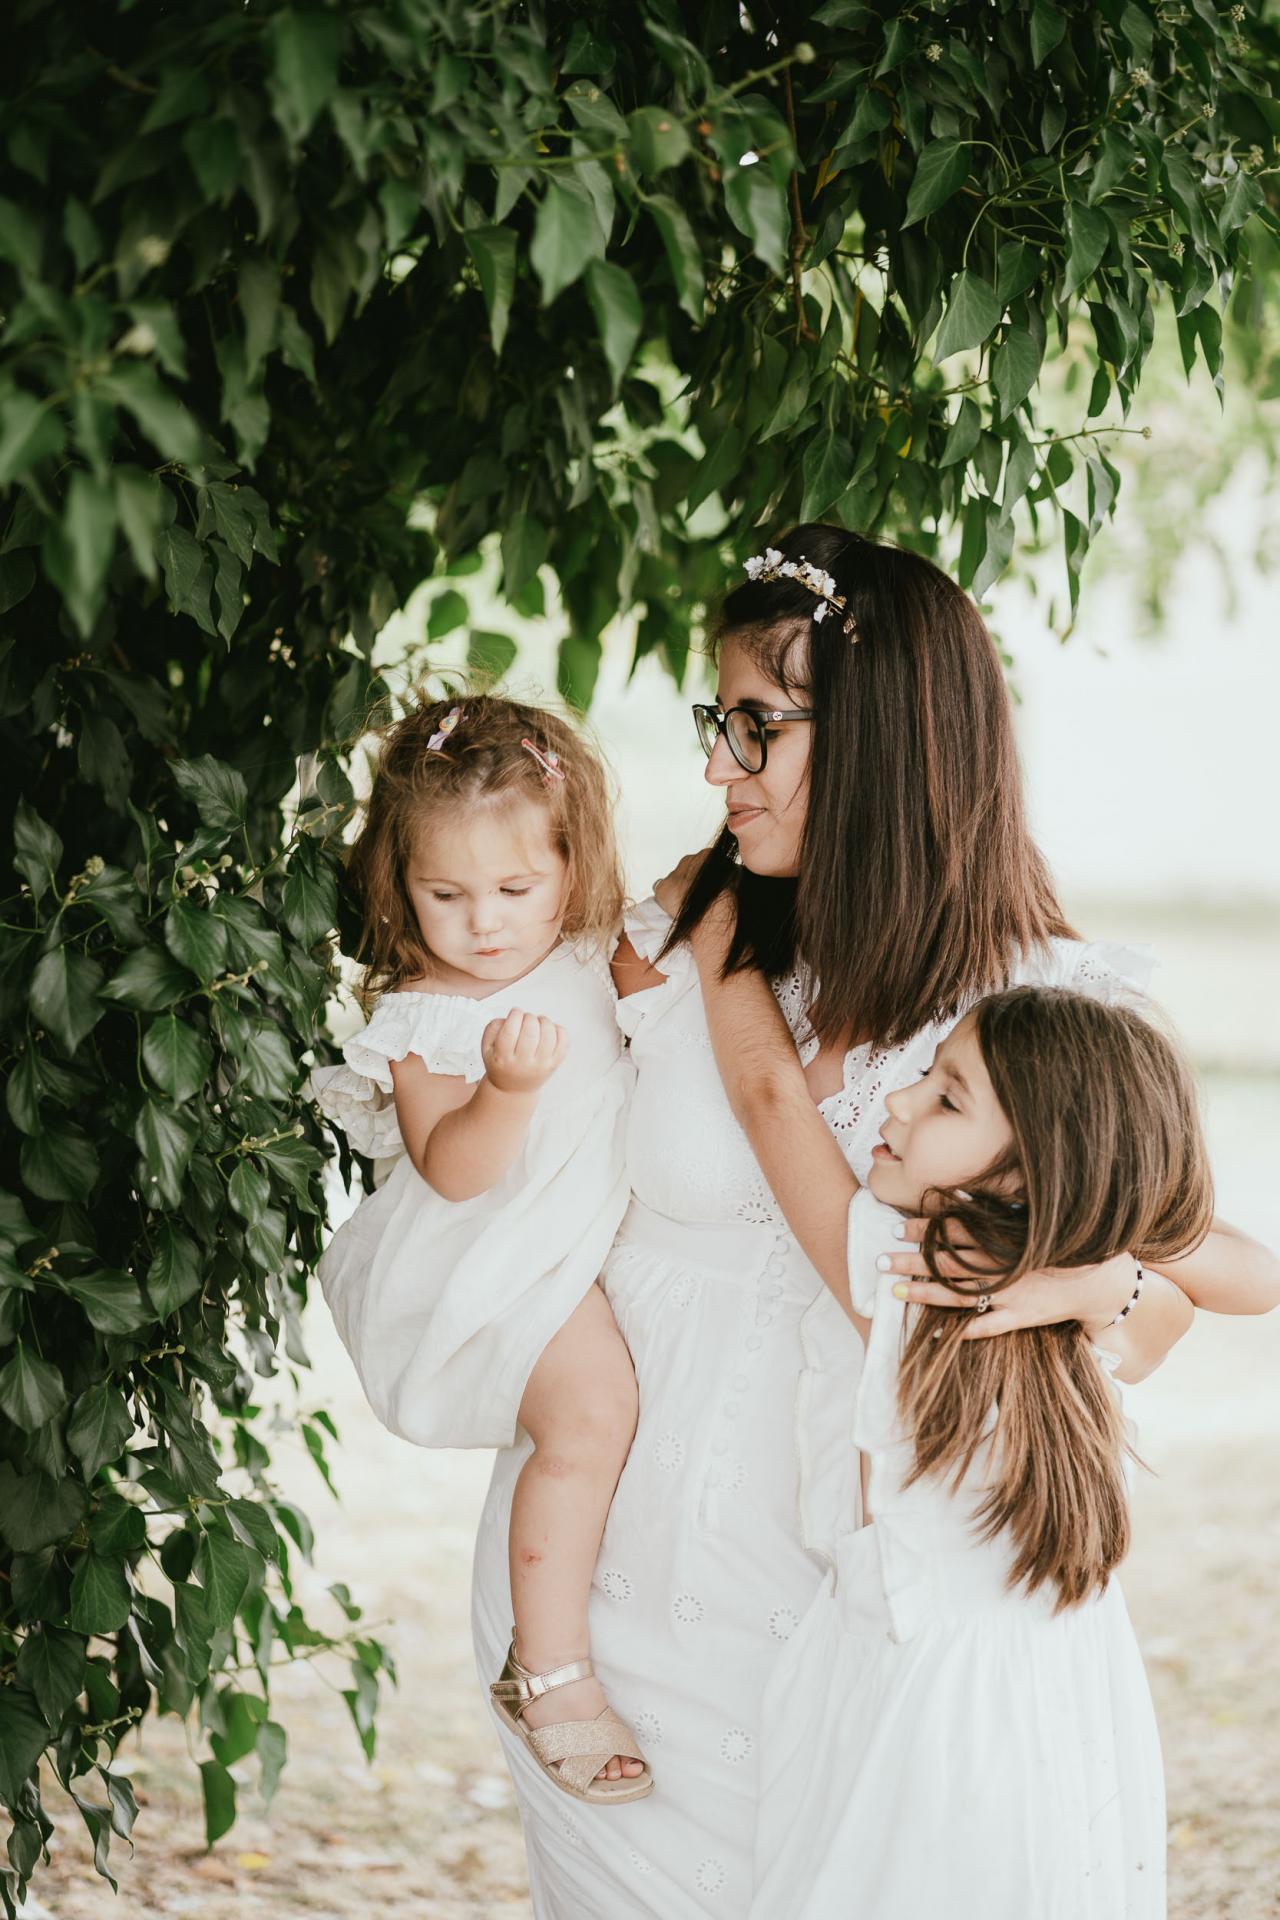 Allison micallef photographe famille maman fille